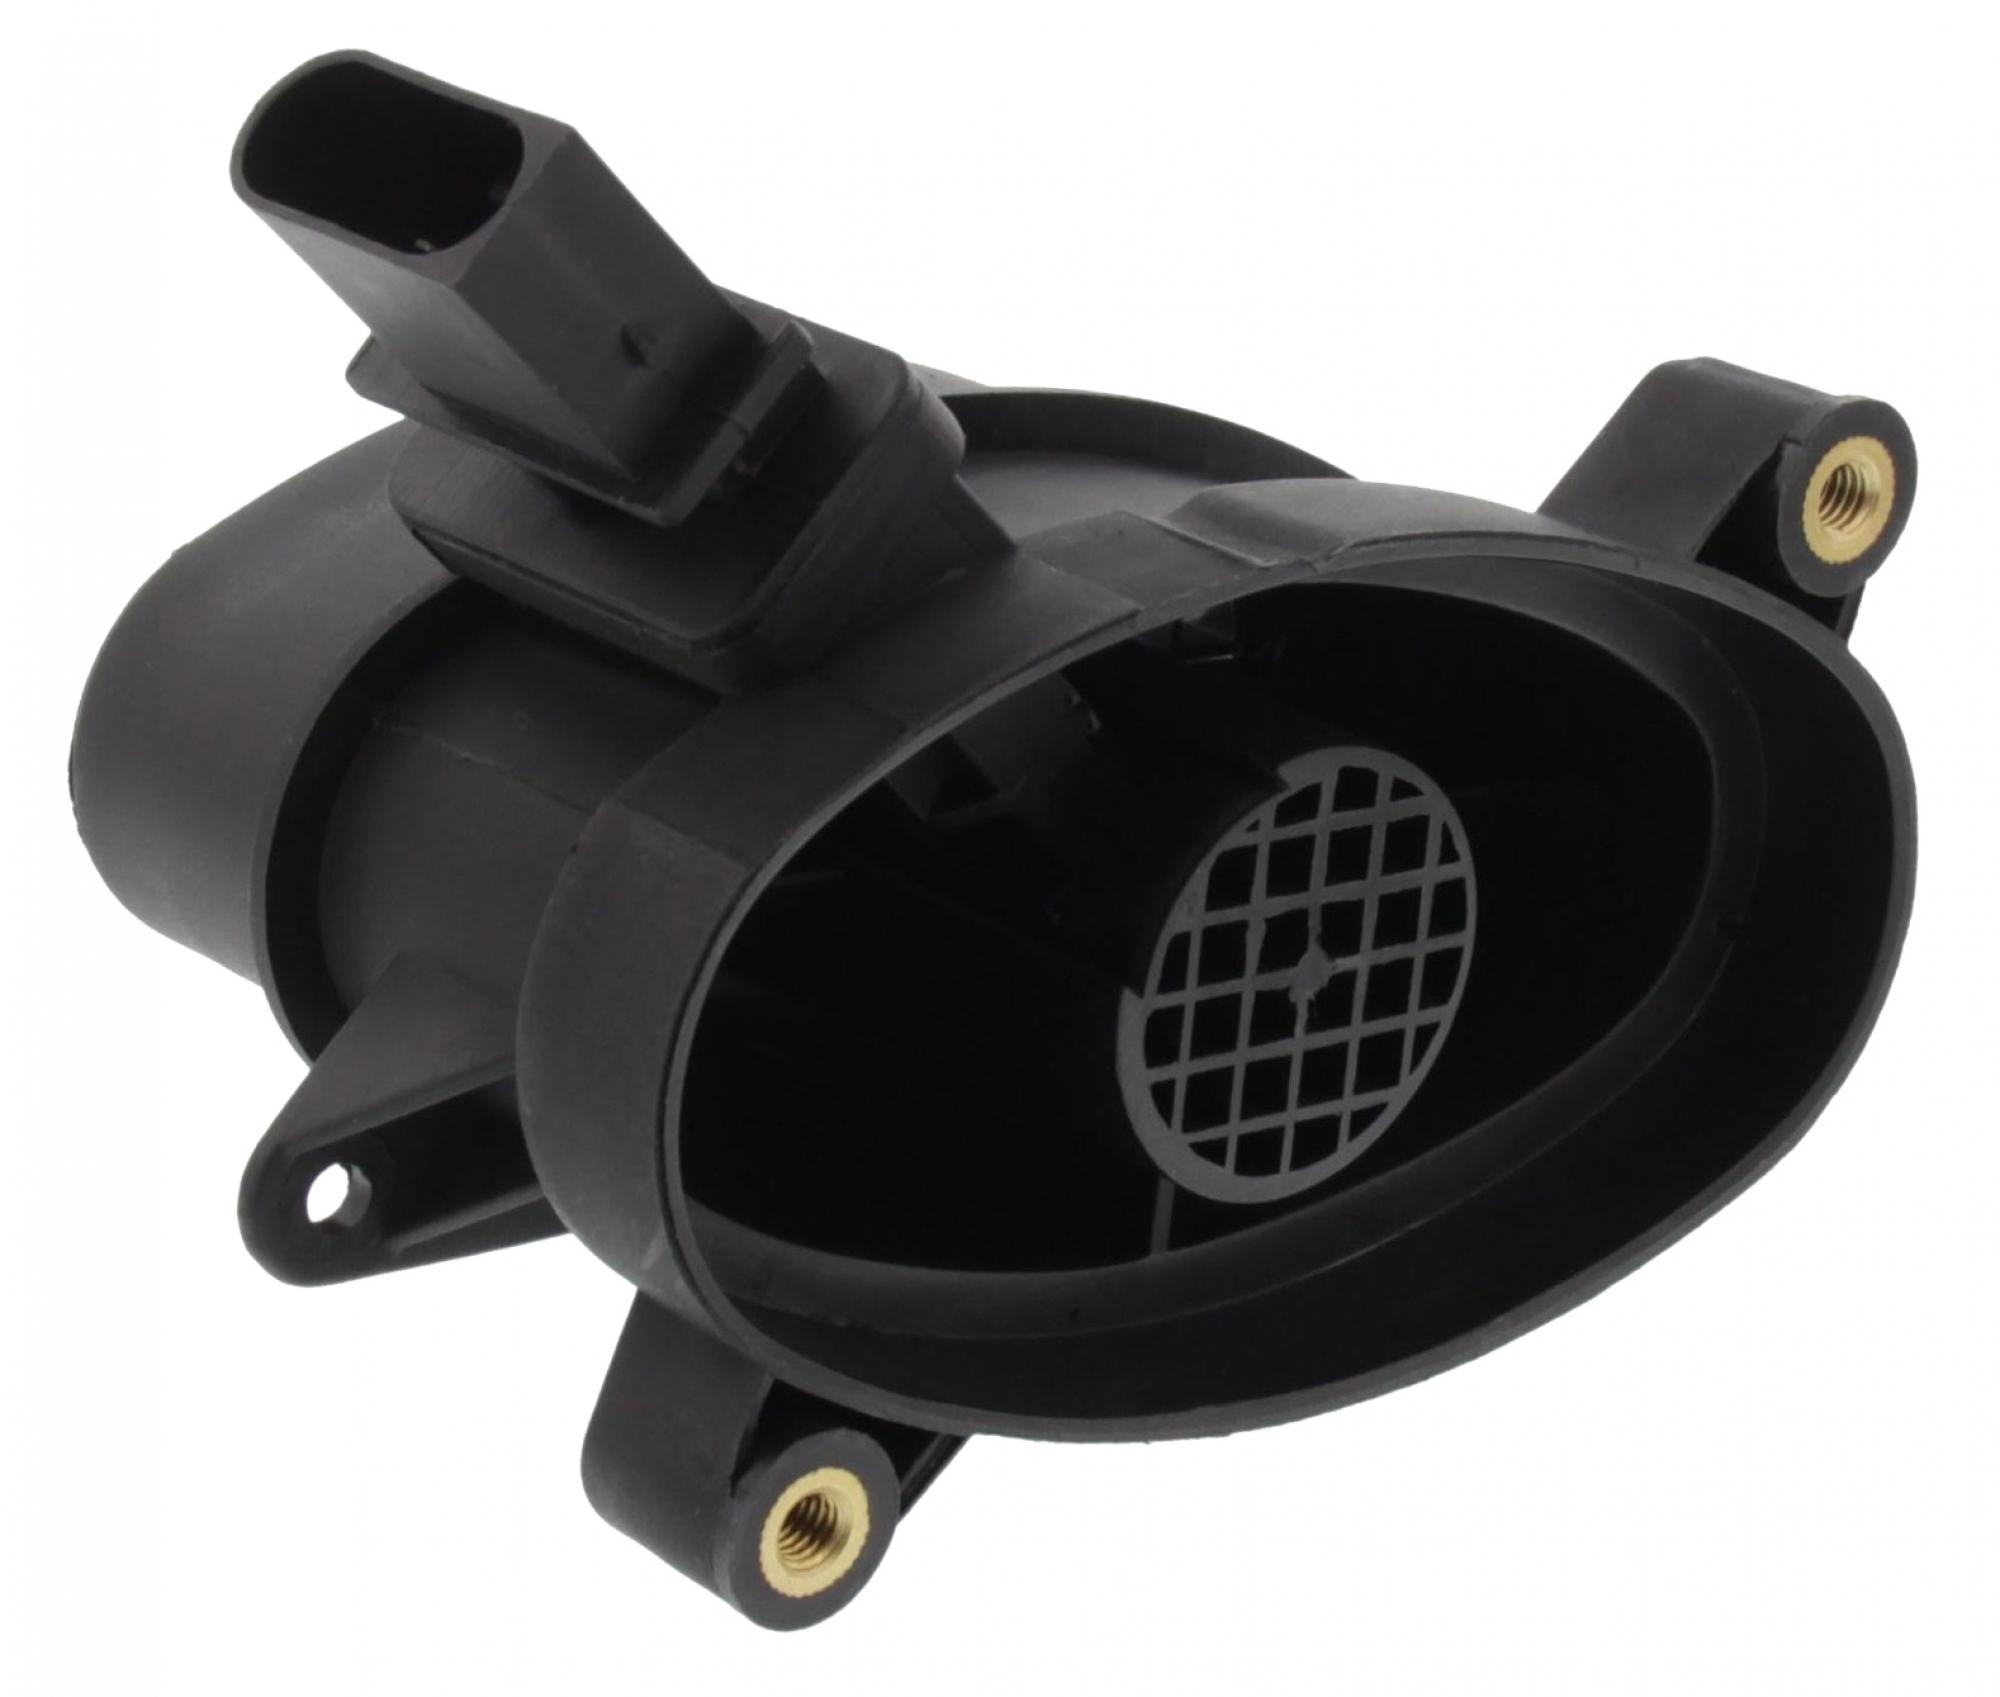 Masse Air Flow Capteur pour BMW X3 E83 E71 E53 X5 X6 2003 /> onwards E70